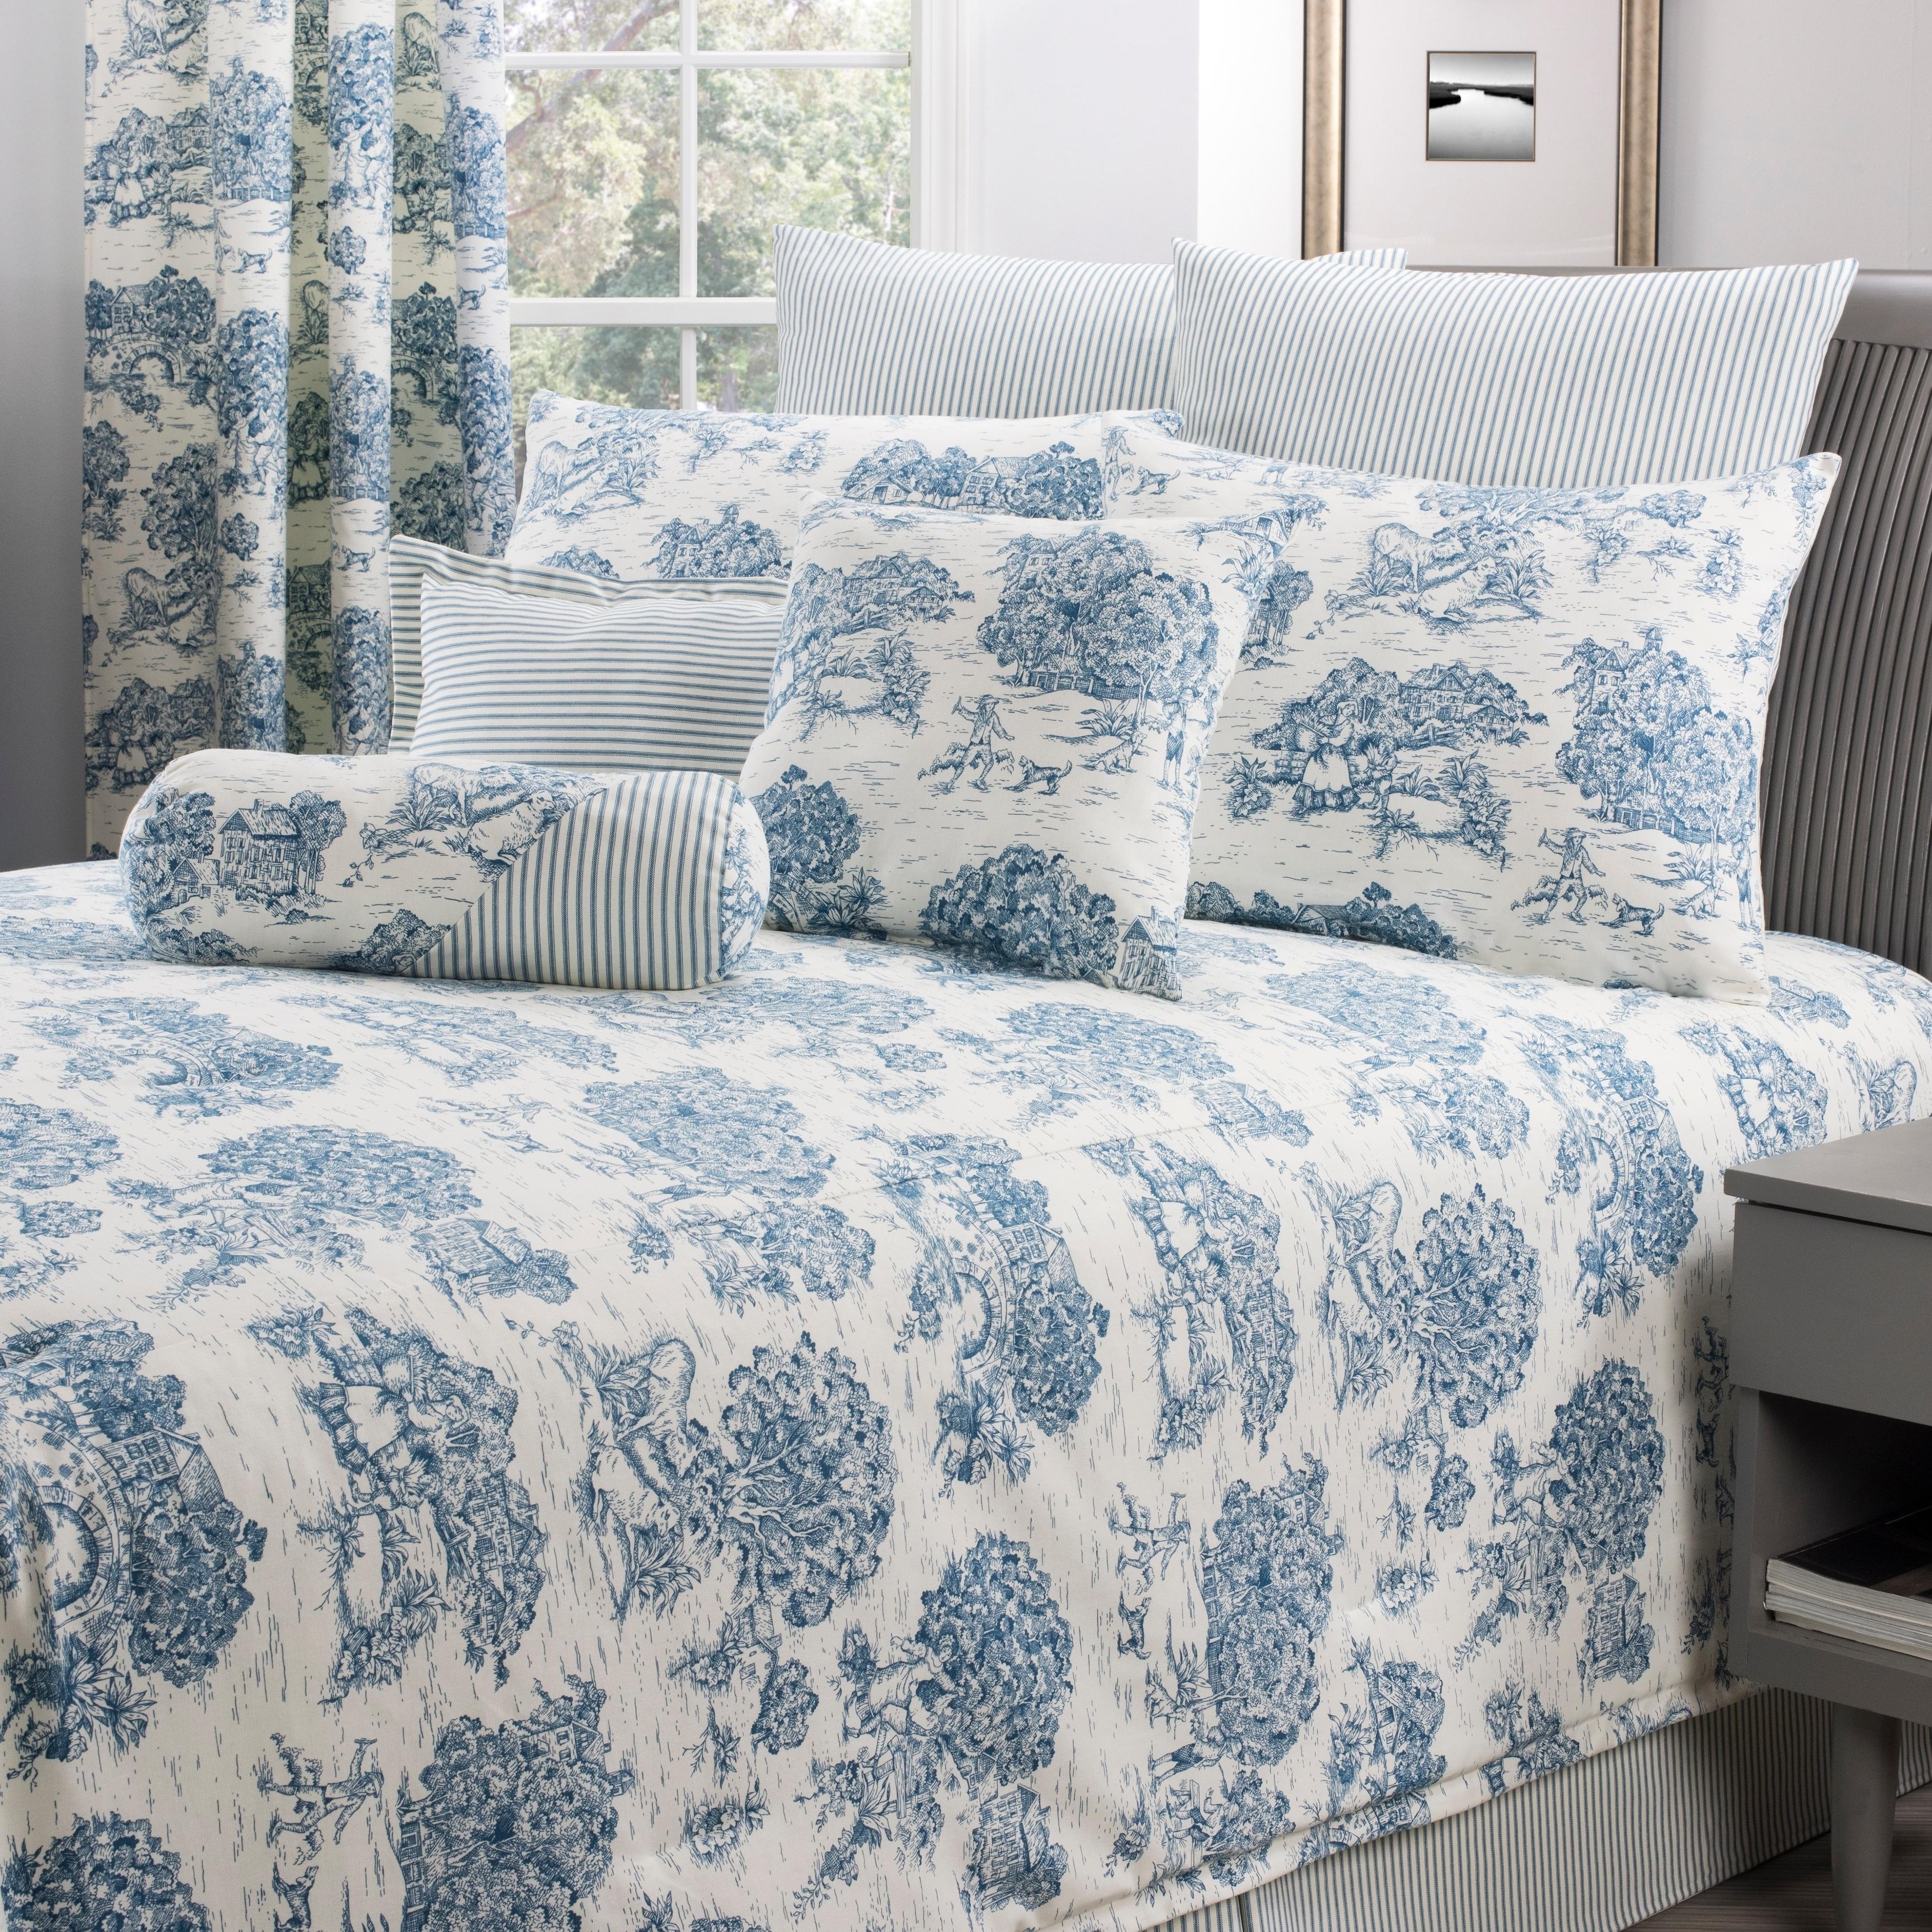 Shop Calais Blue Toile Comforter Set Size King Overstock 19562765